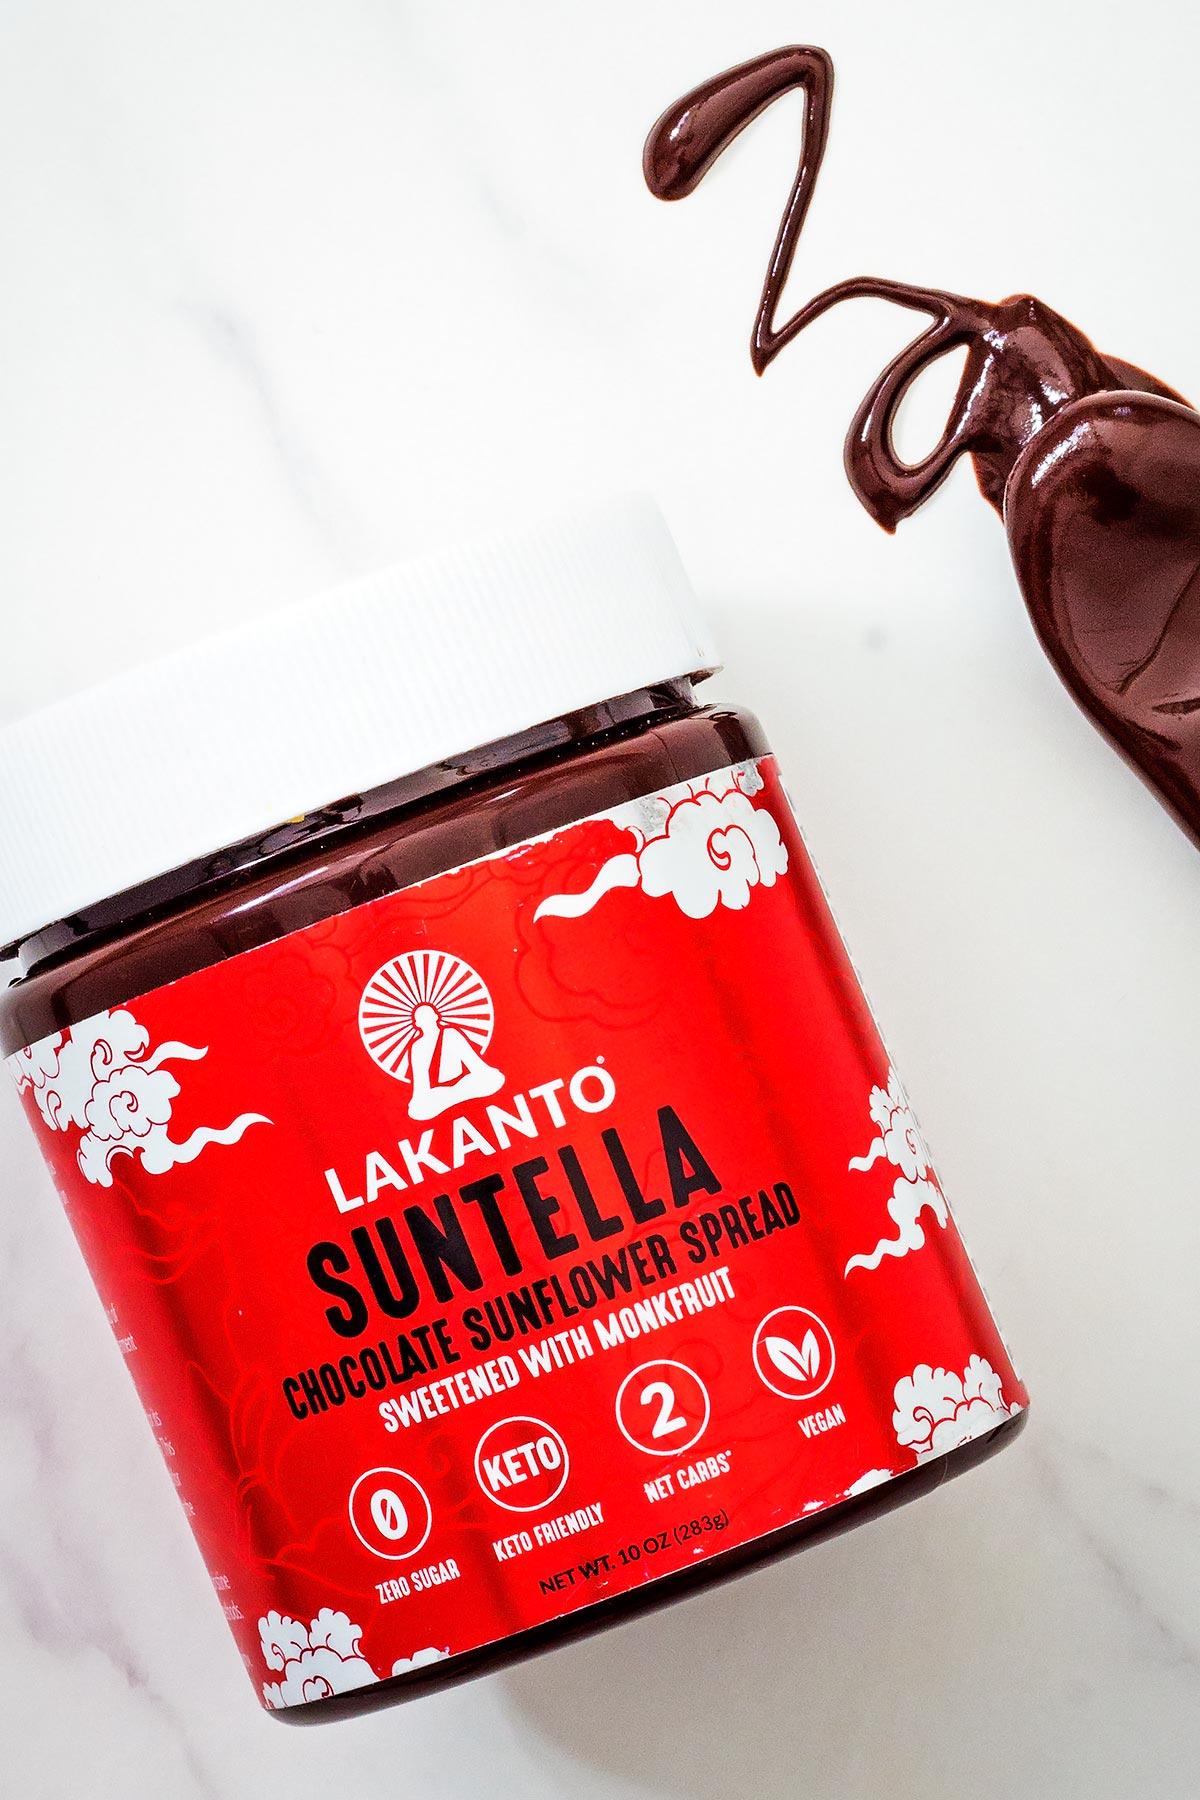 Lakanto Suntella Chocolate Spread